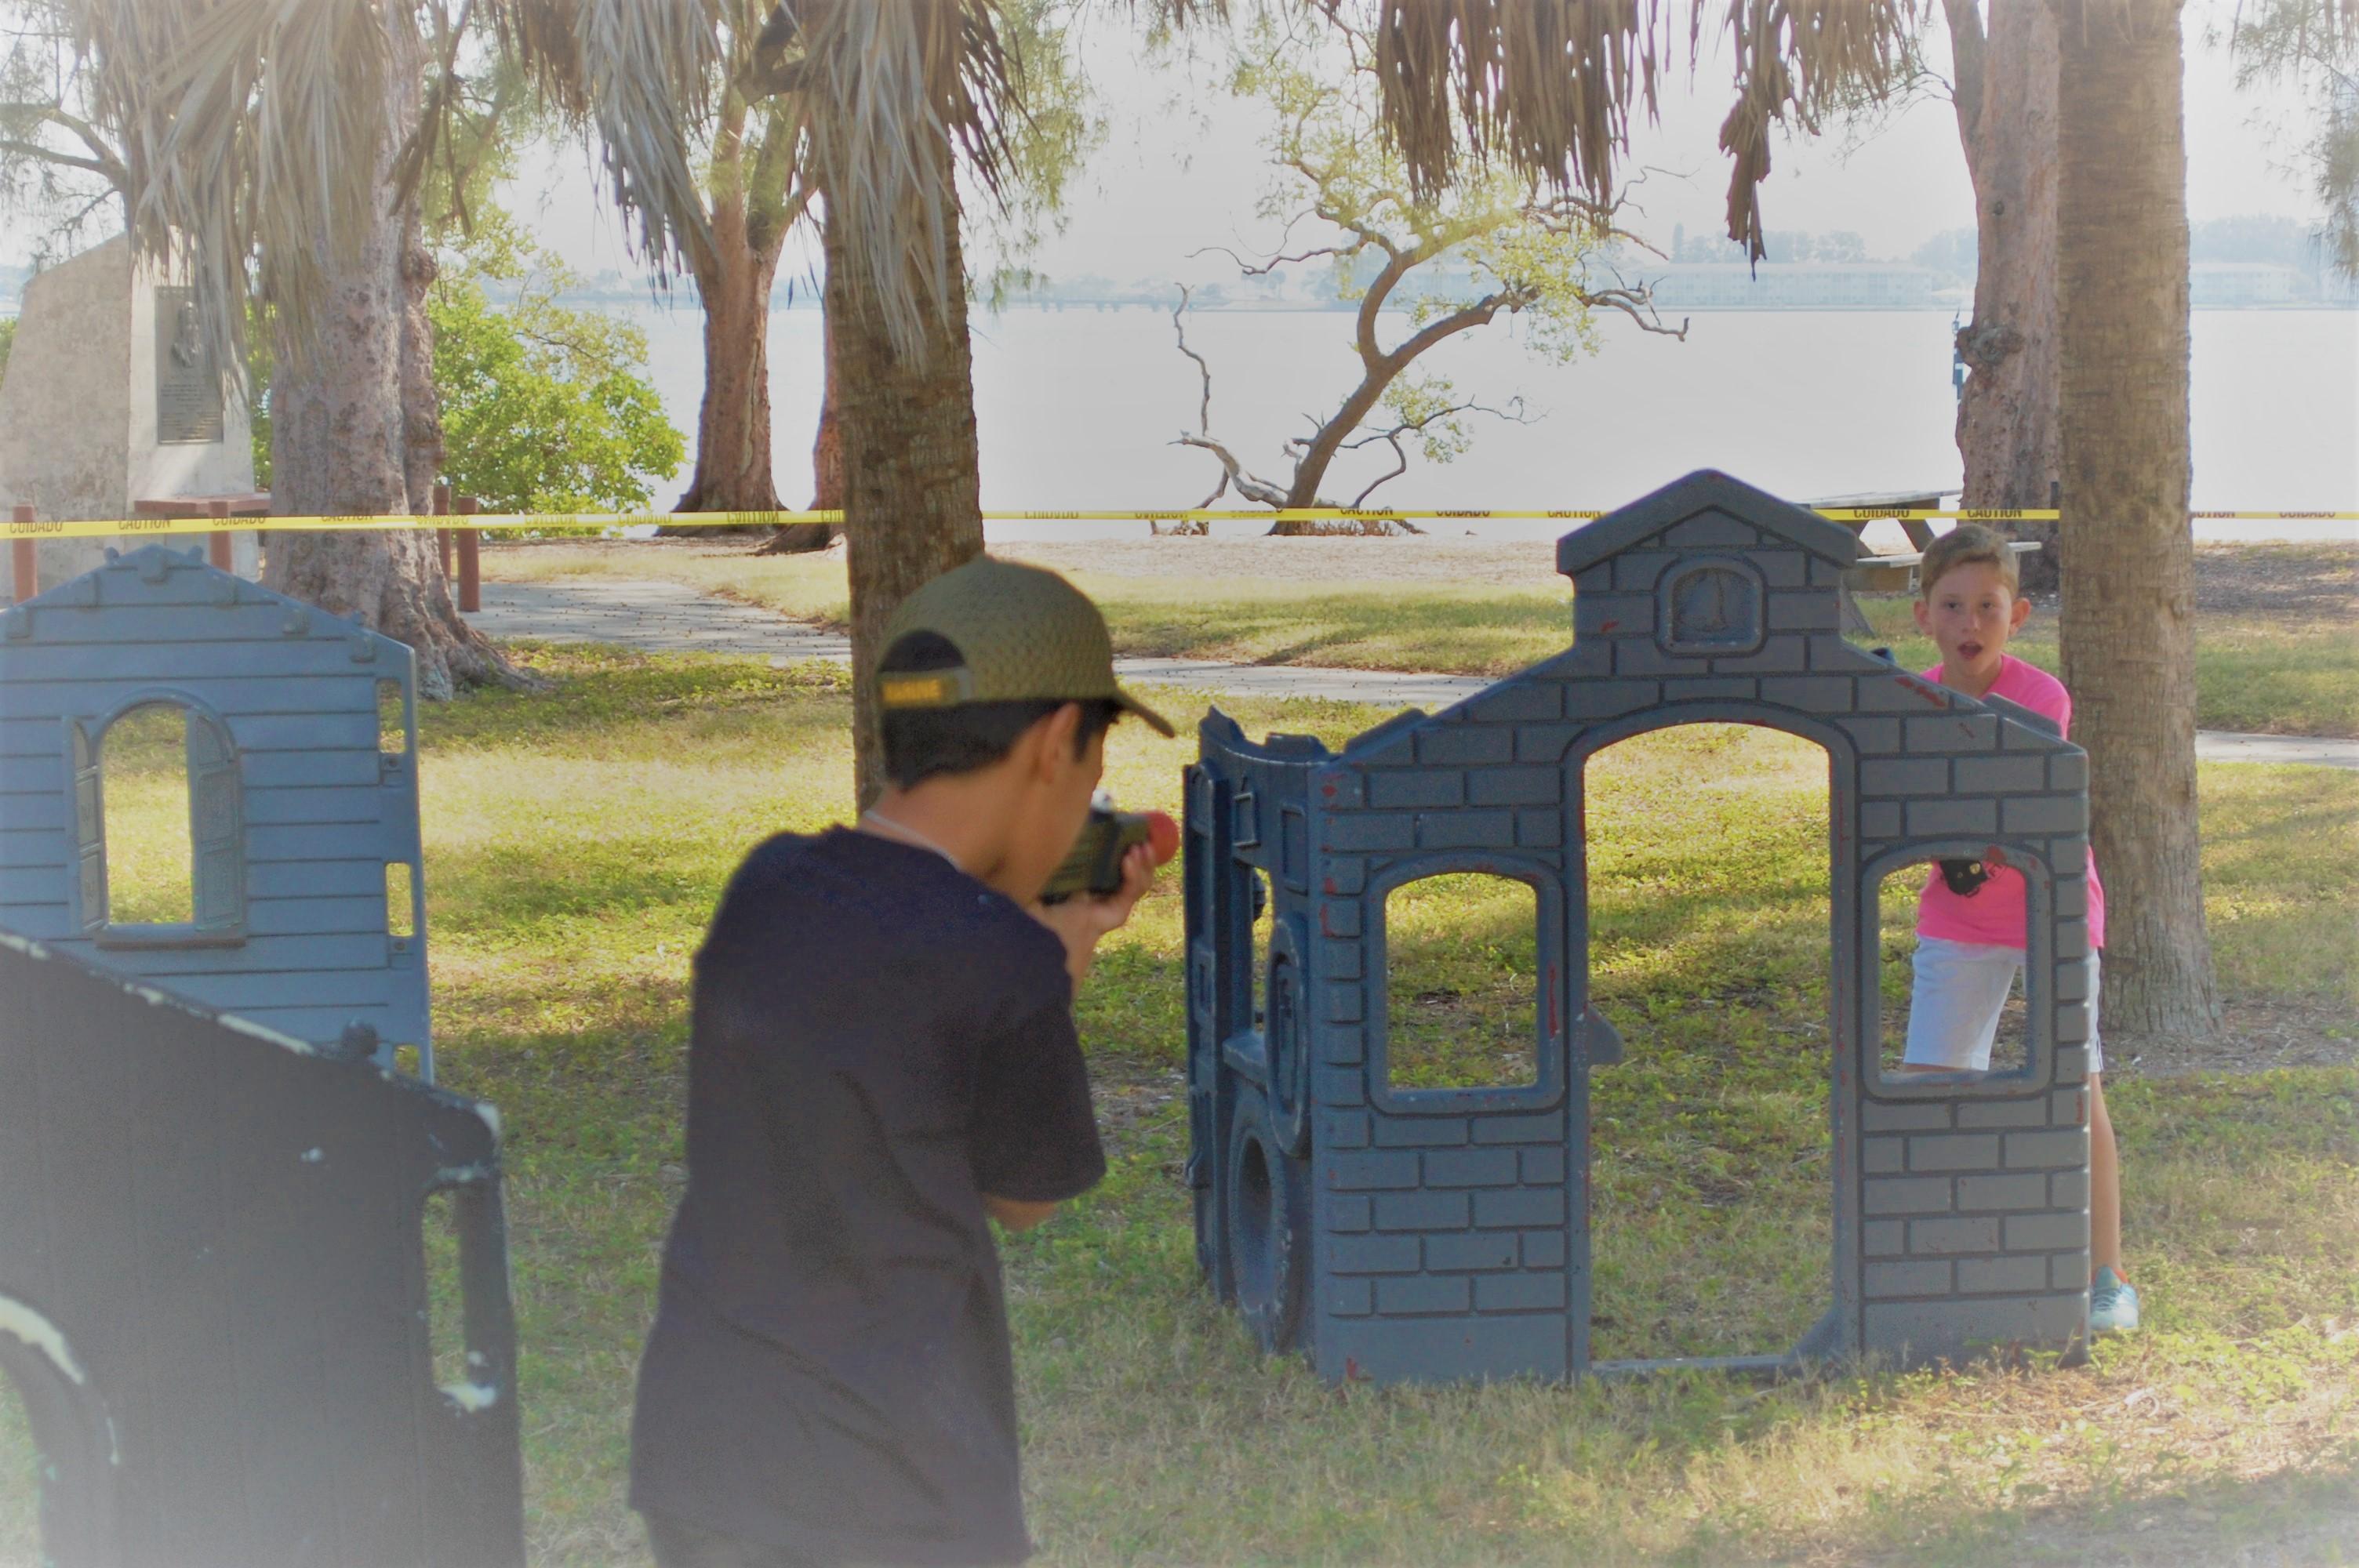 Mobile Laser Tag Marco Island,FL